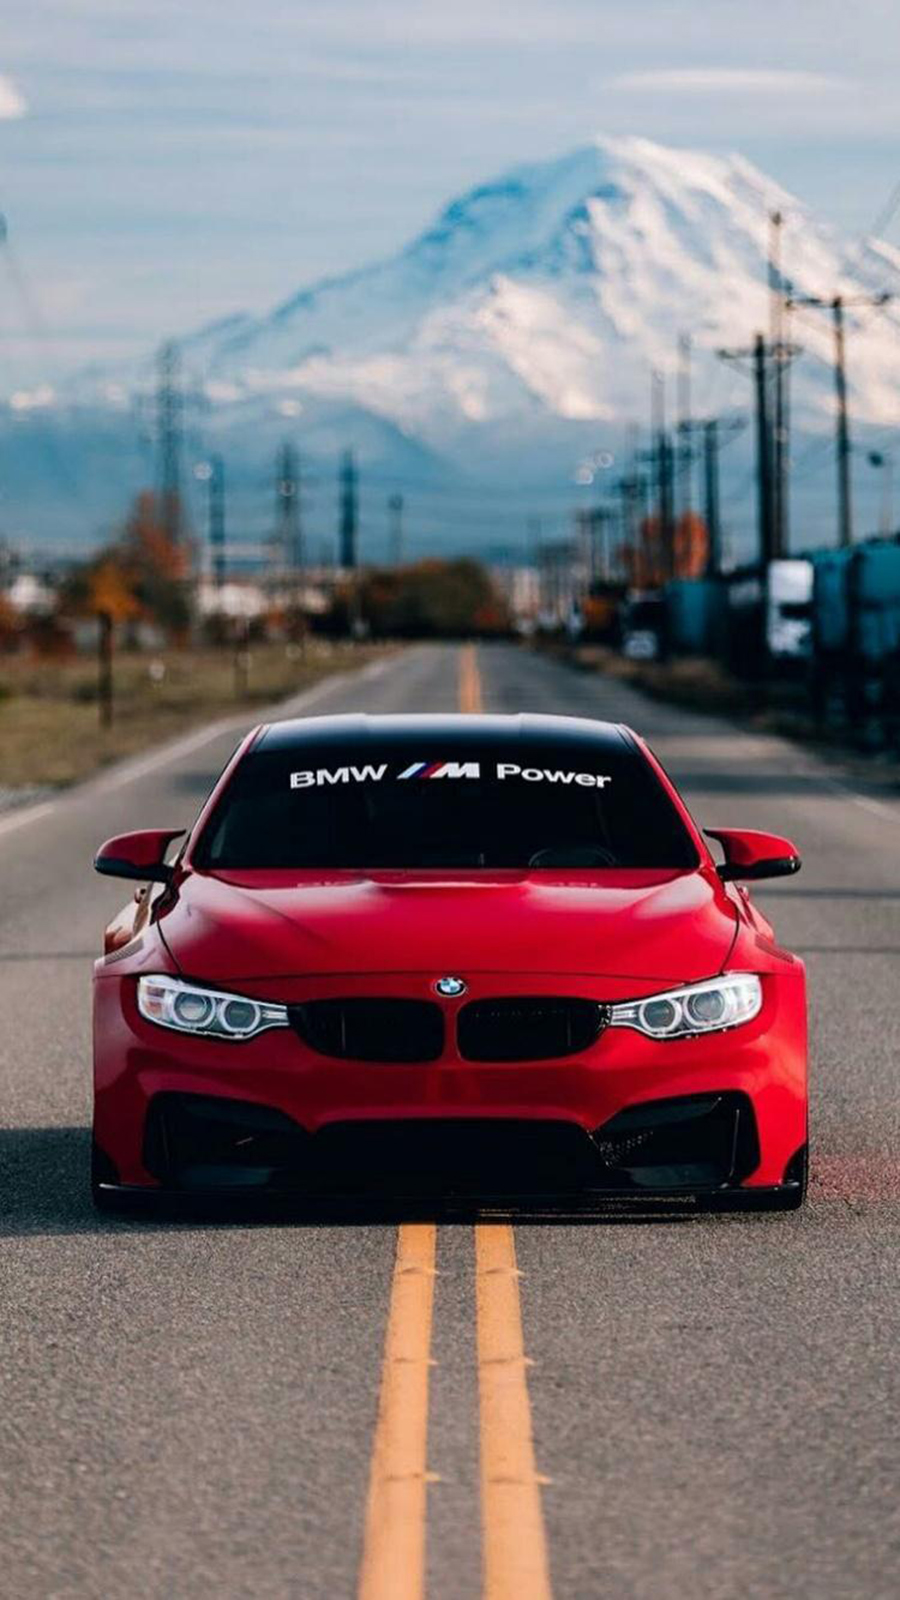 BMW Wallpaper – Trend Bmw Wallpapers Free Download